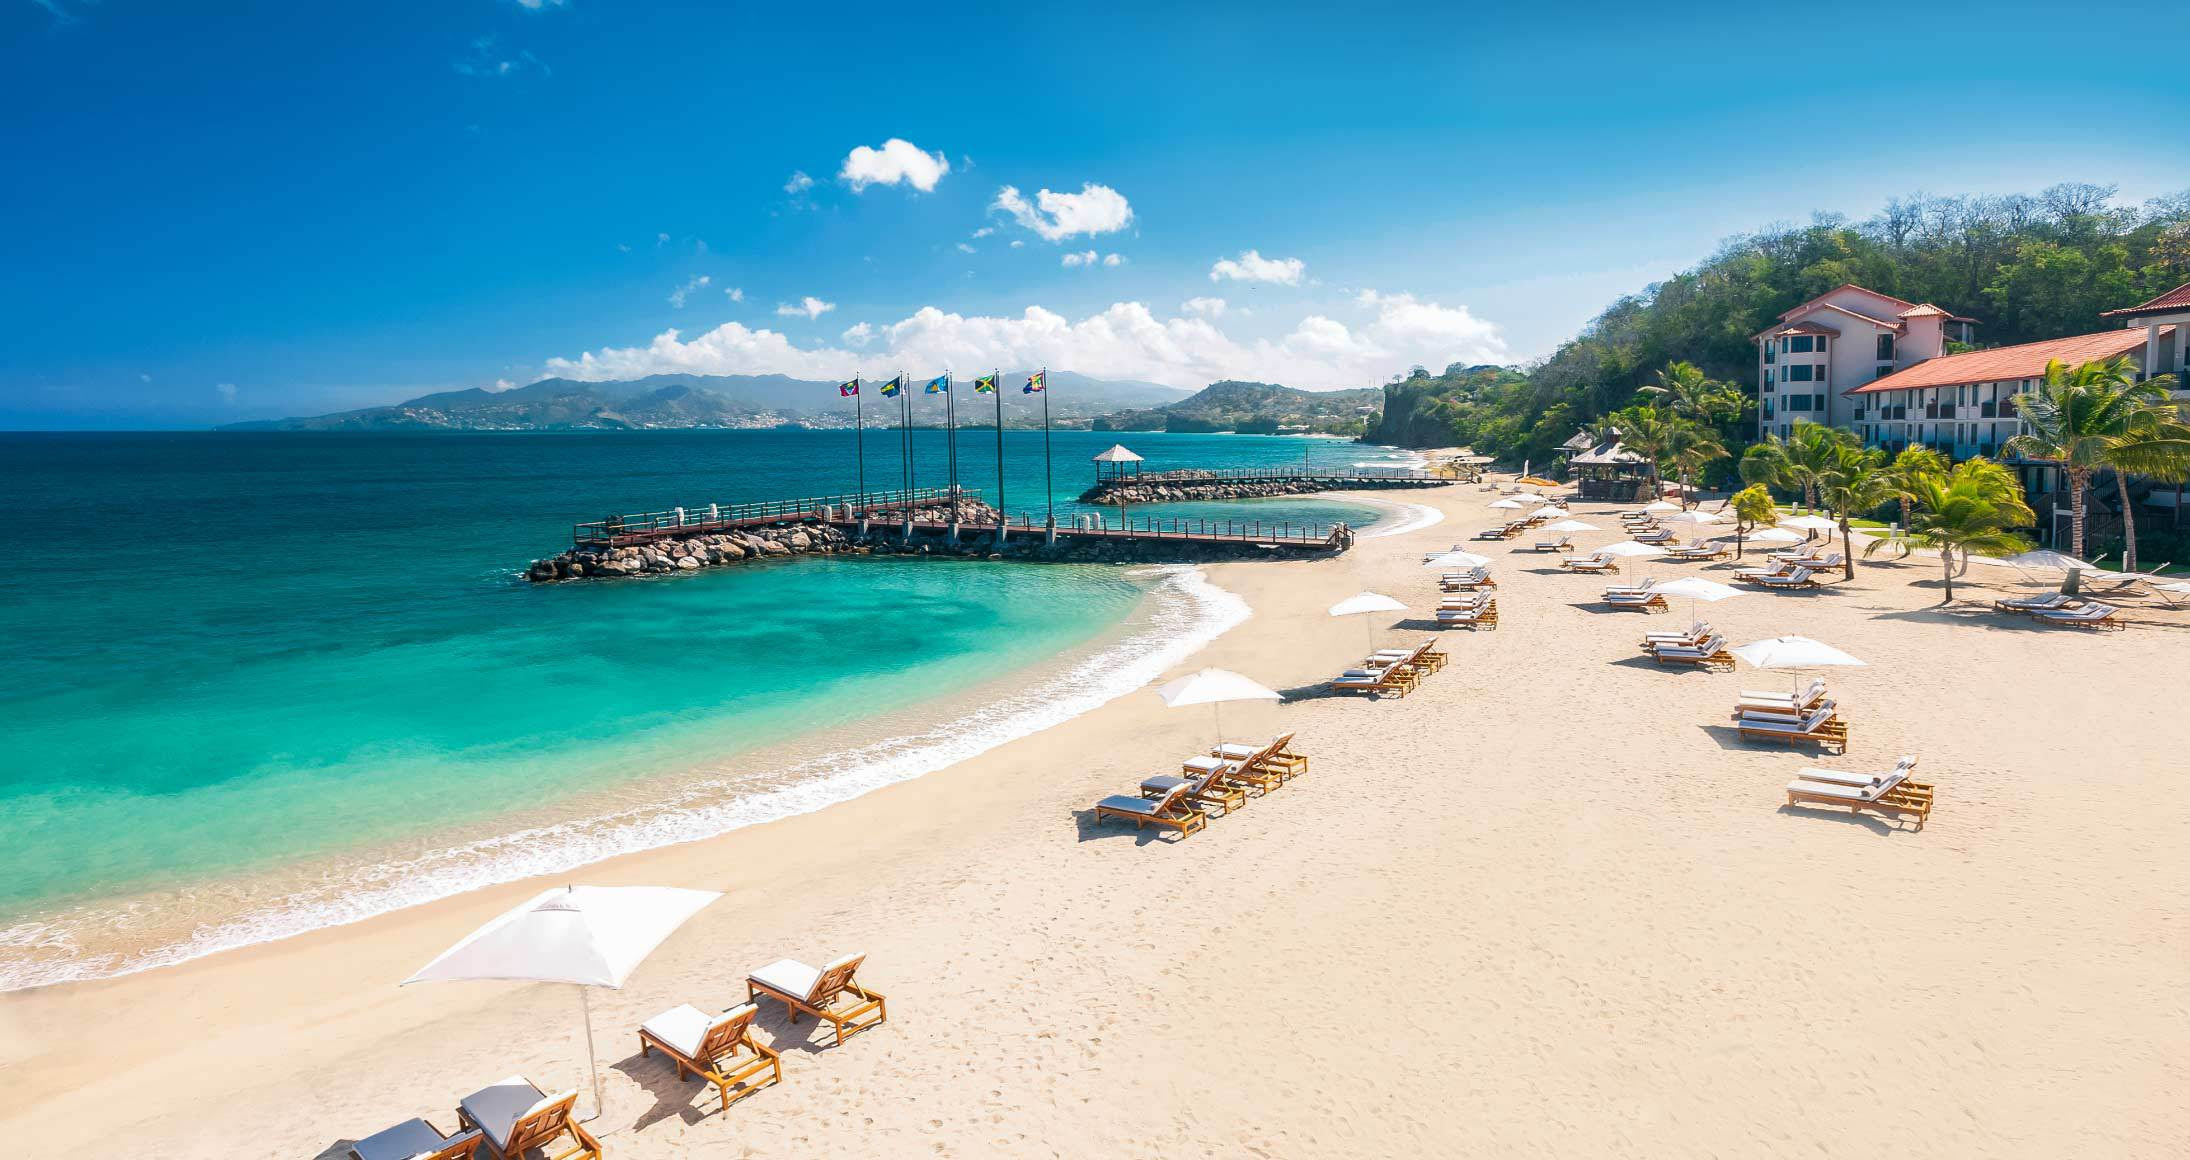 Sandals Grenada Luxury All Inclusive Resort in St George